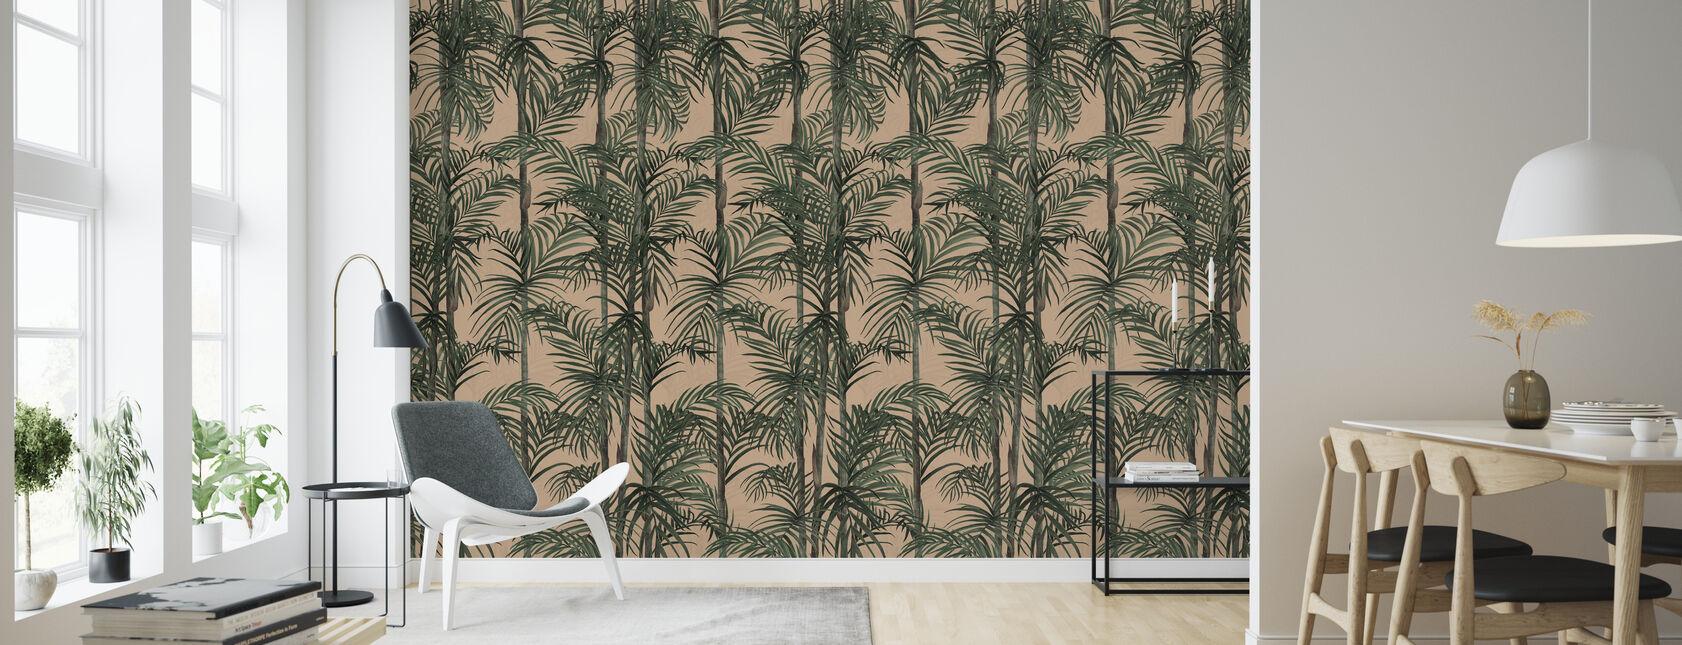 Botany Bamboo - Afternoon Blush - Wallpaper - Living Room